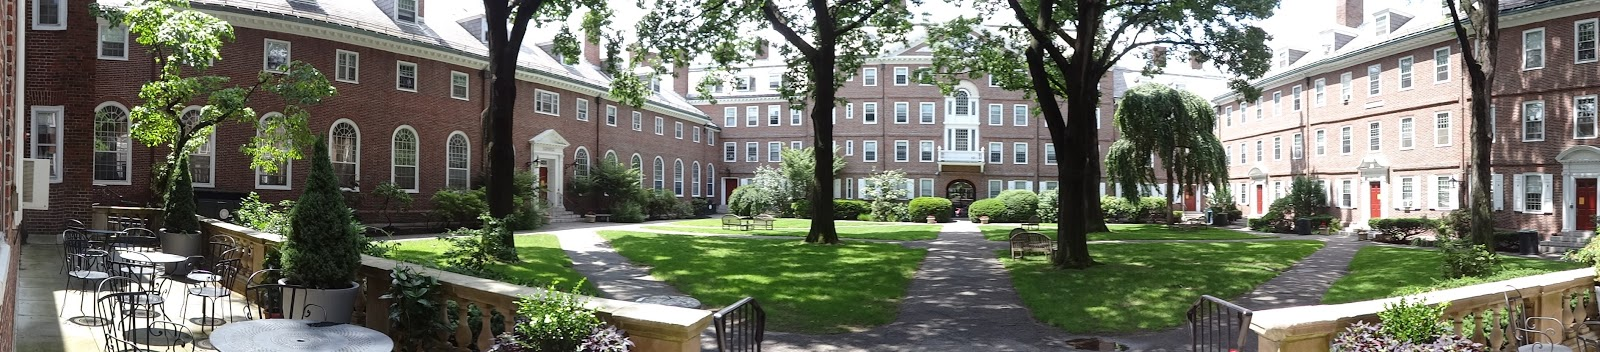 Kirkland House Courtyard